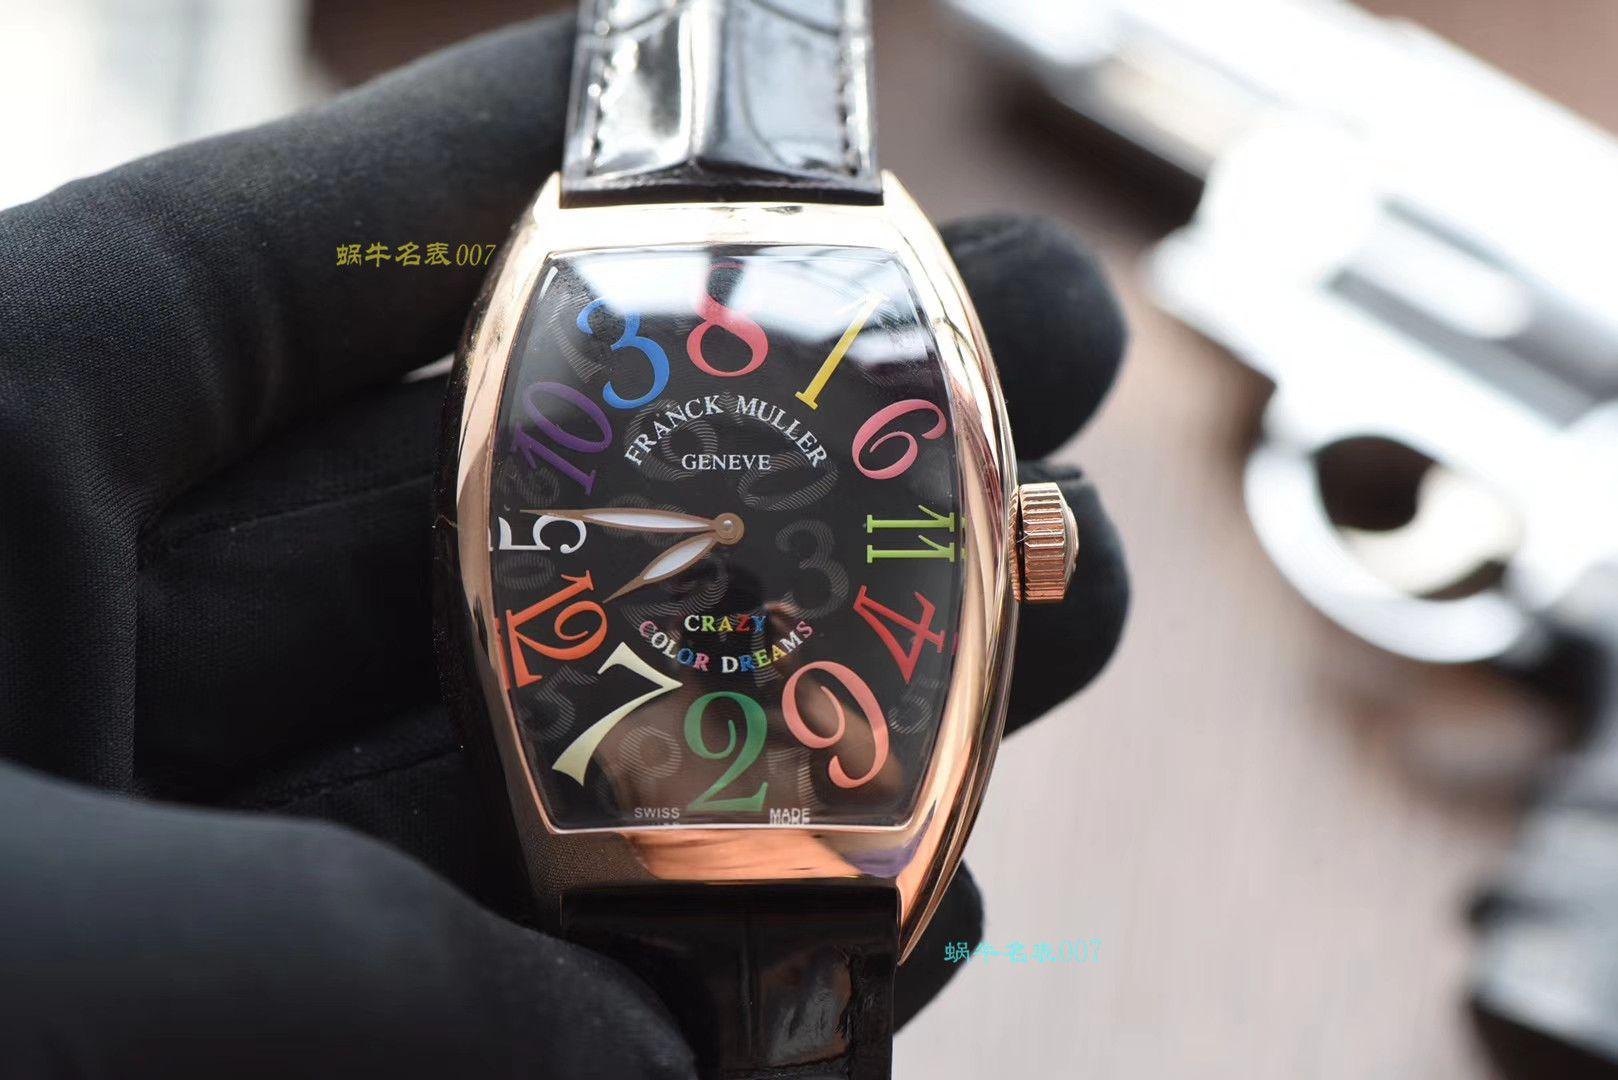 Franck Muller法穆兰(法兰克穆勒)CRAZY HOURS 系列8880 CH腕表 / FL032